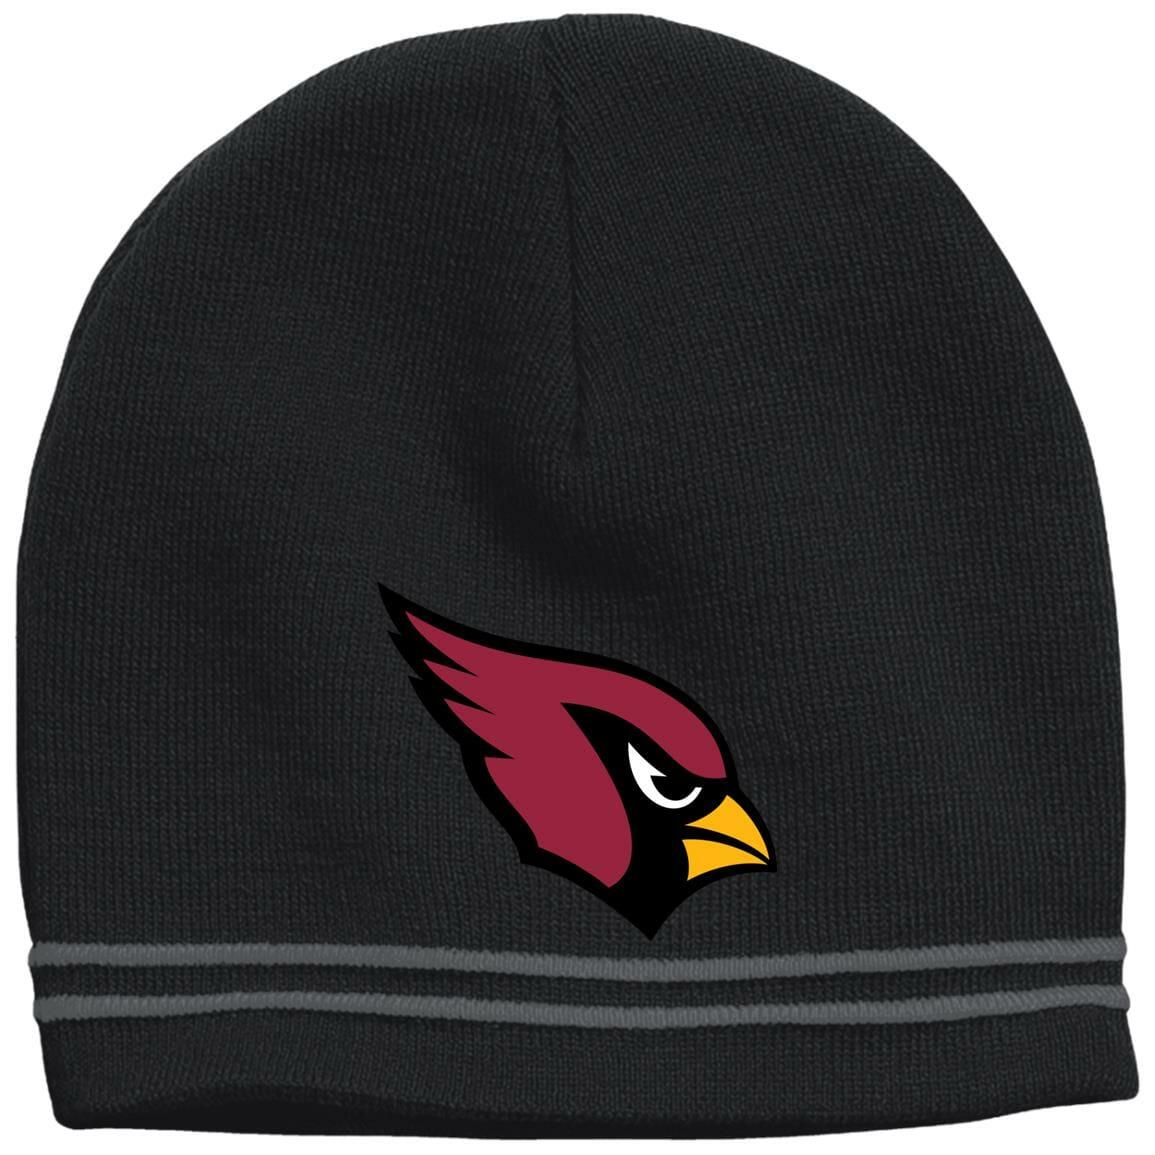 Private: Arizona Cardinals Colorblock Beanie